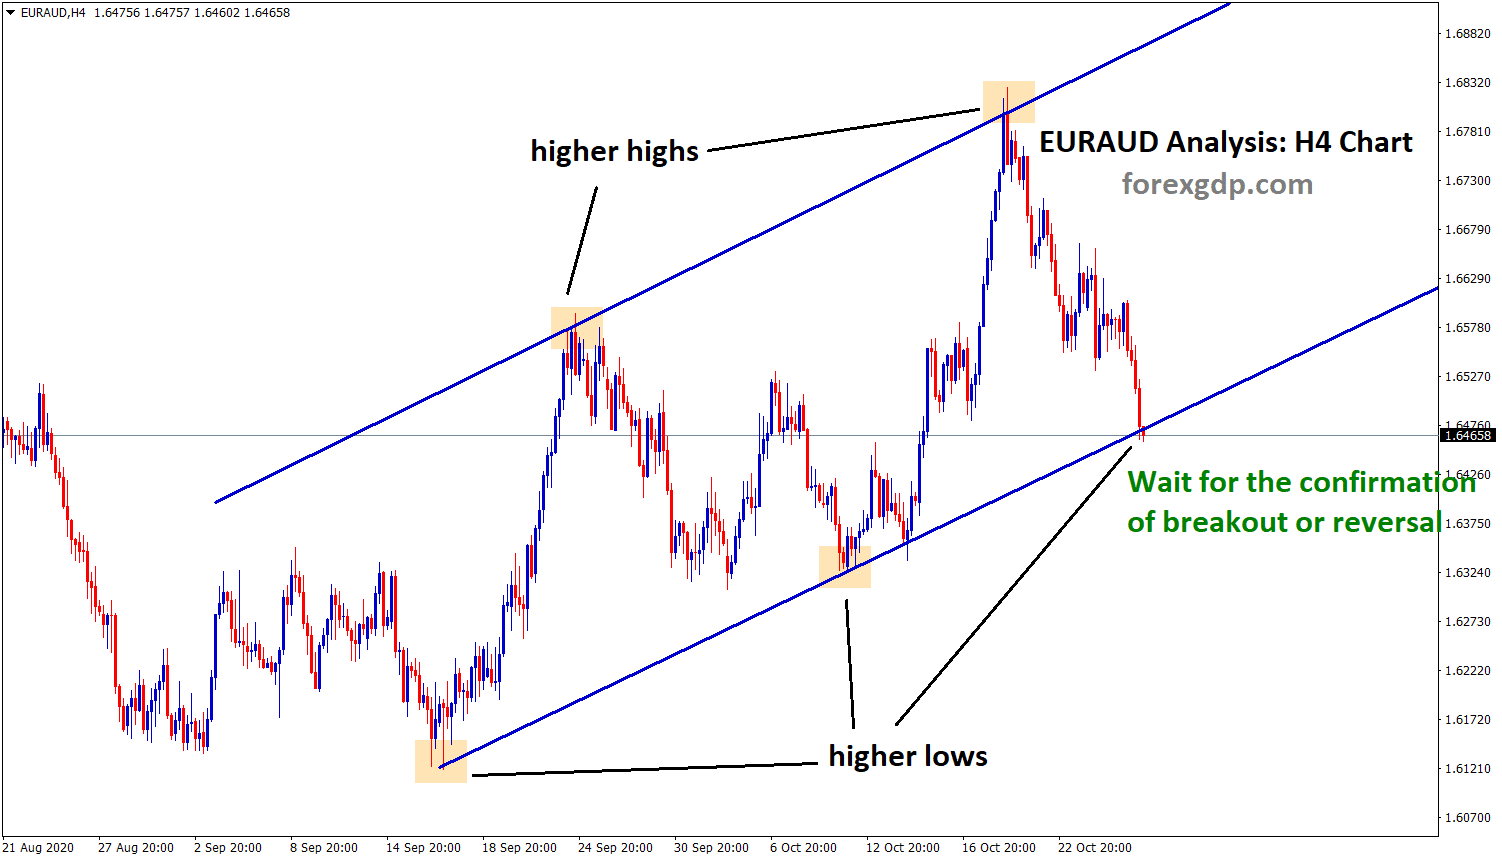 EURAUD Uptrend higher low analysis